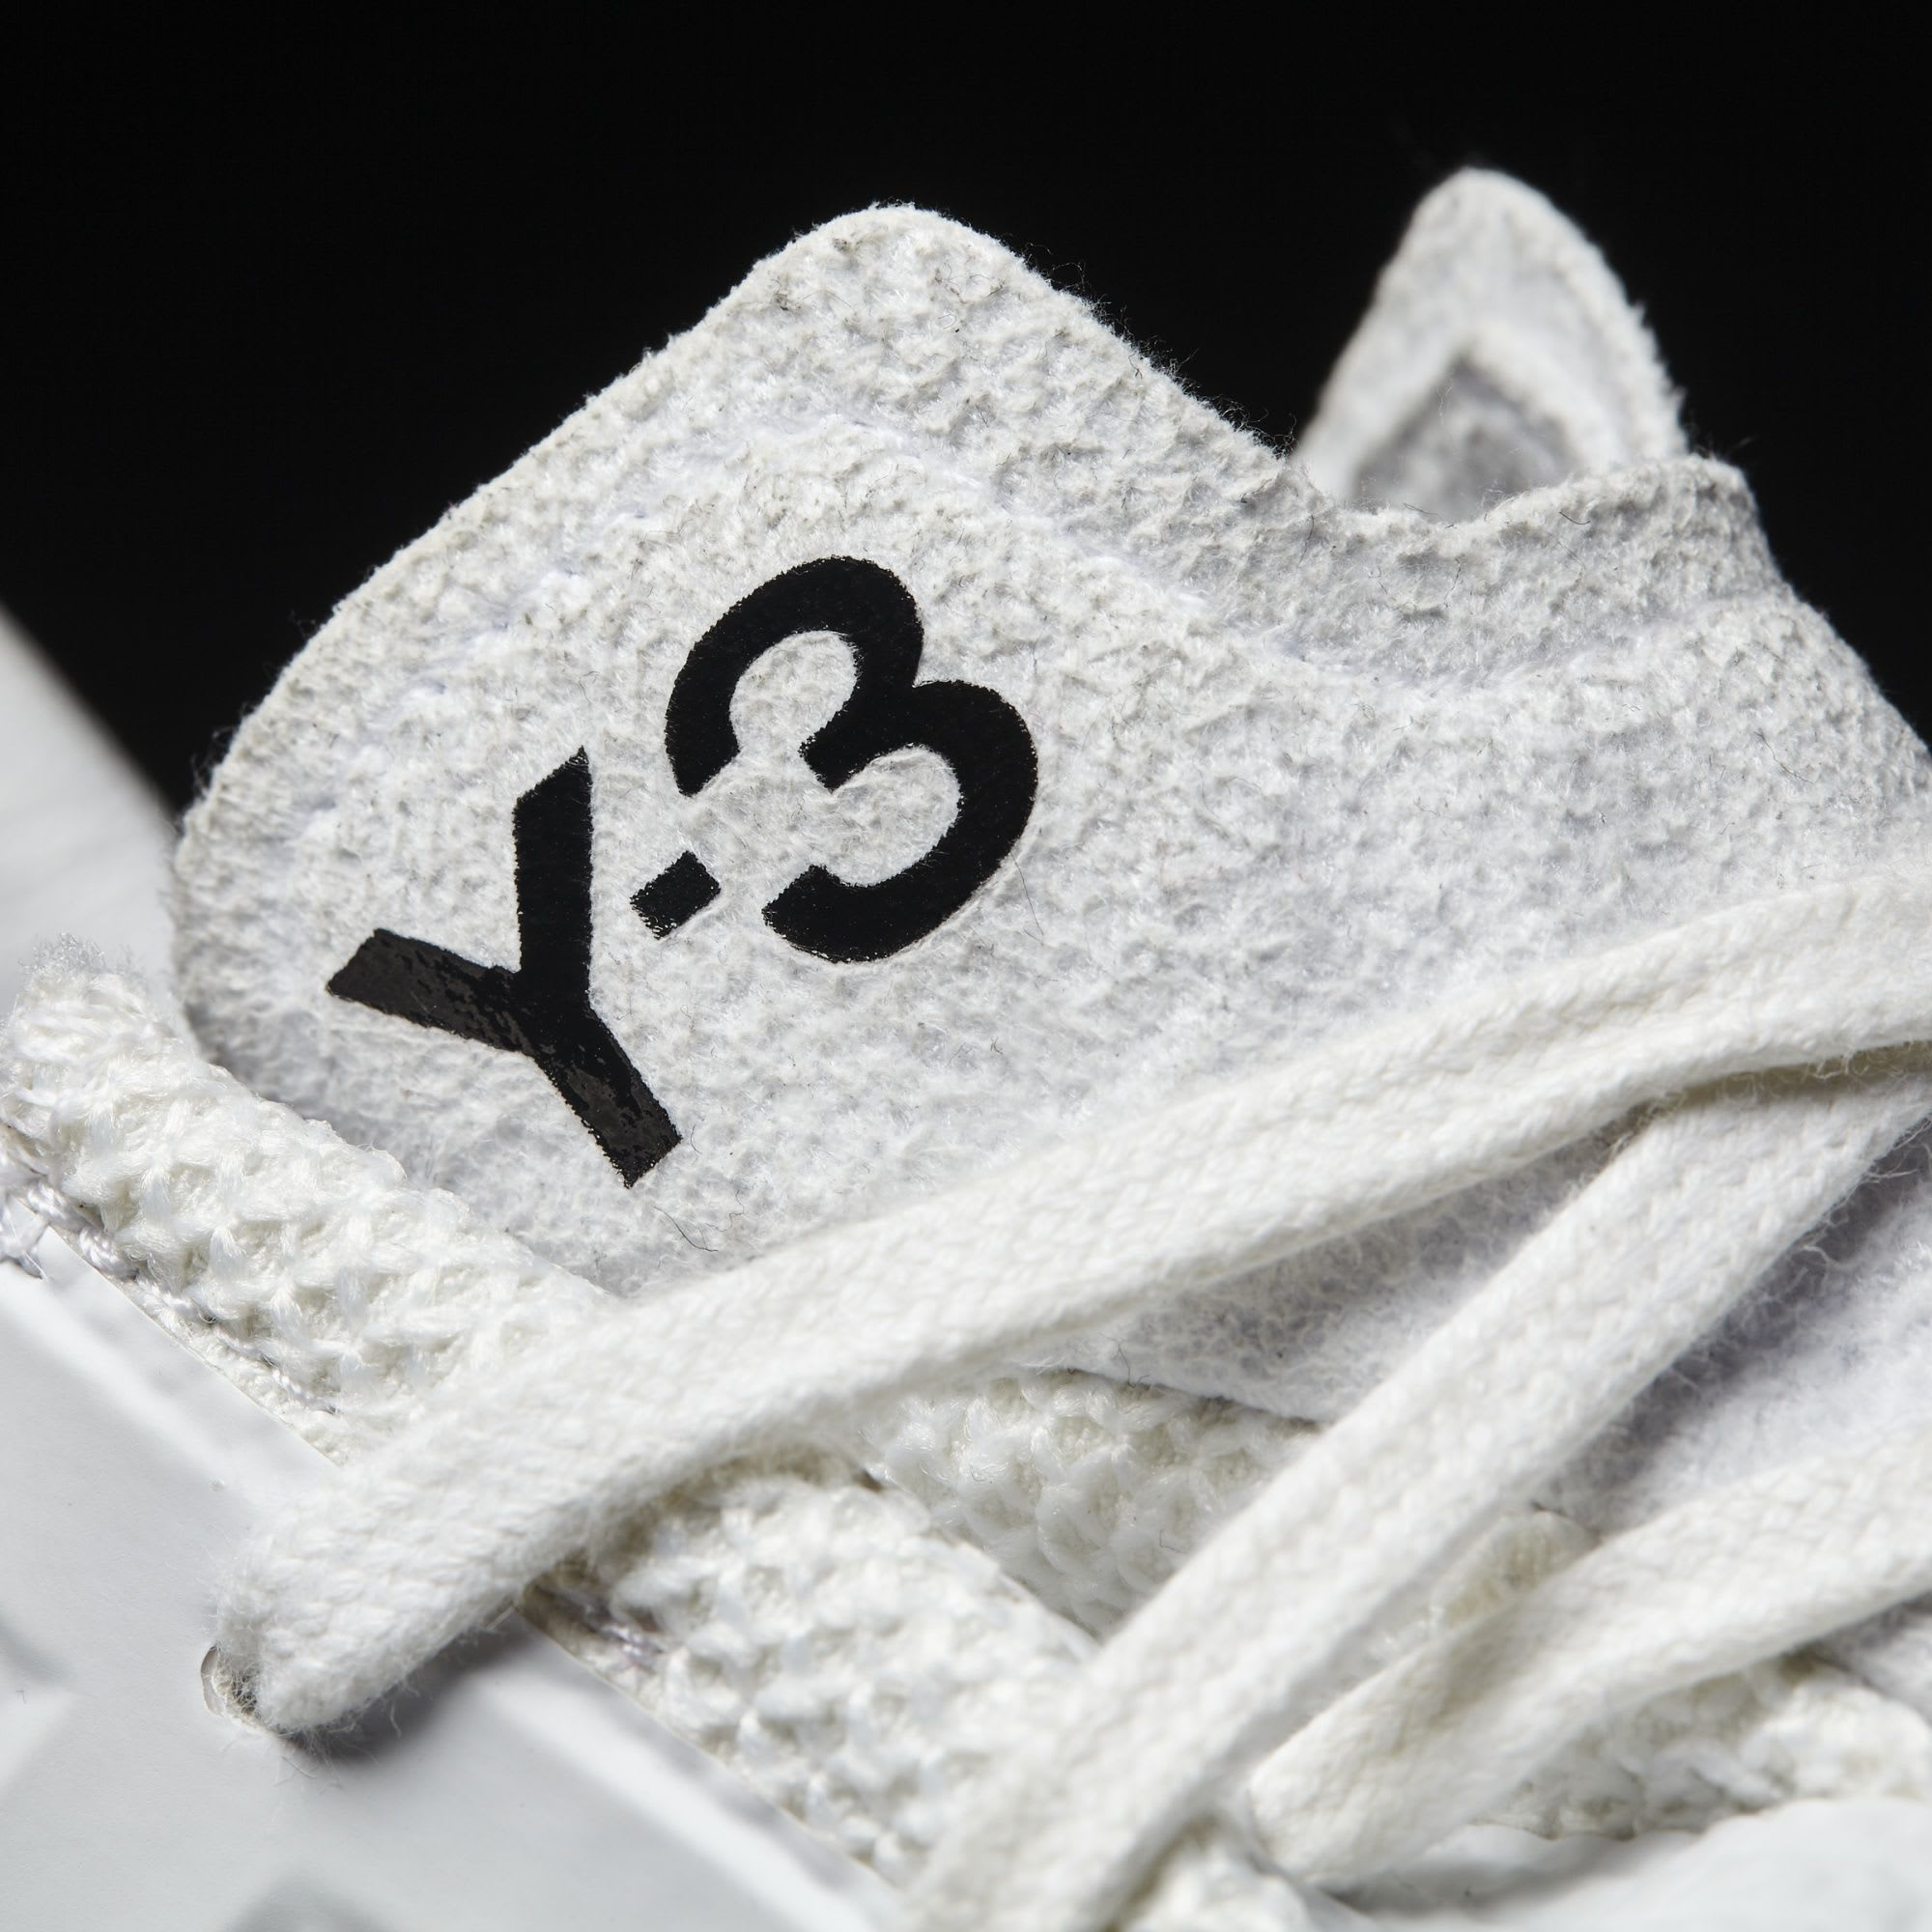 6d4839f0a18 Image via Adidas Adidas Y3 Pureboost White BY8955 Tongue